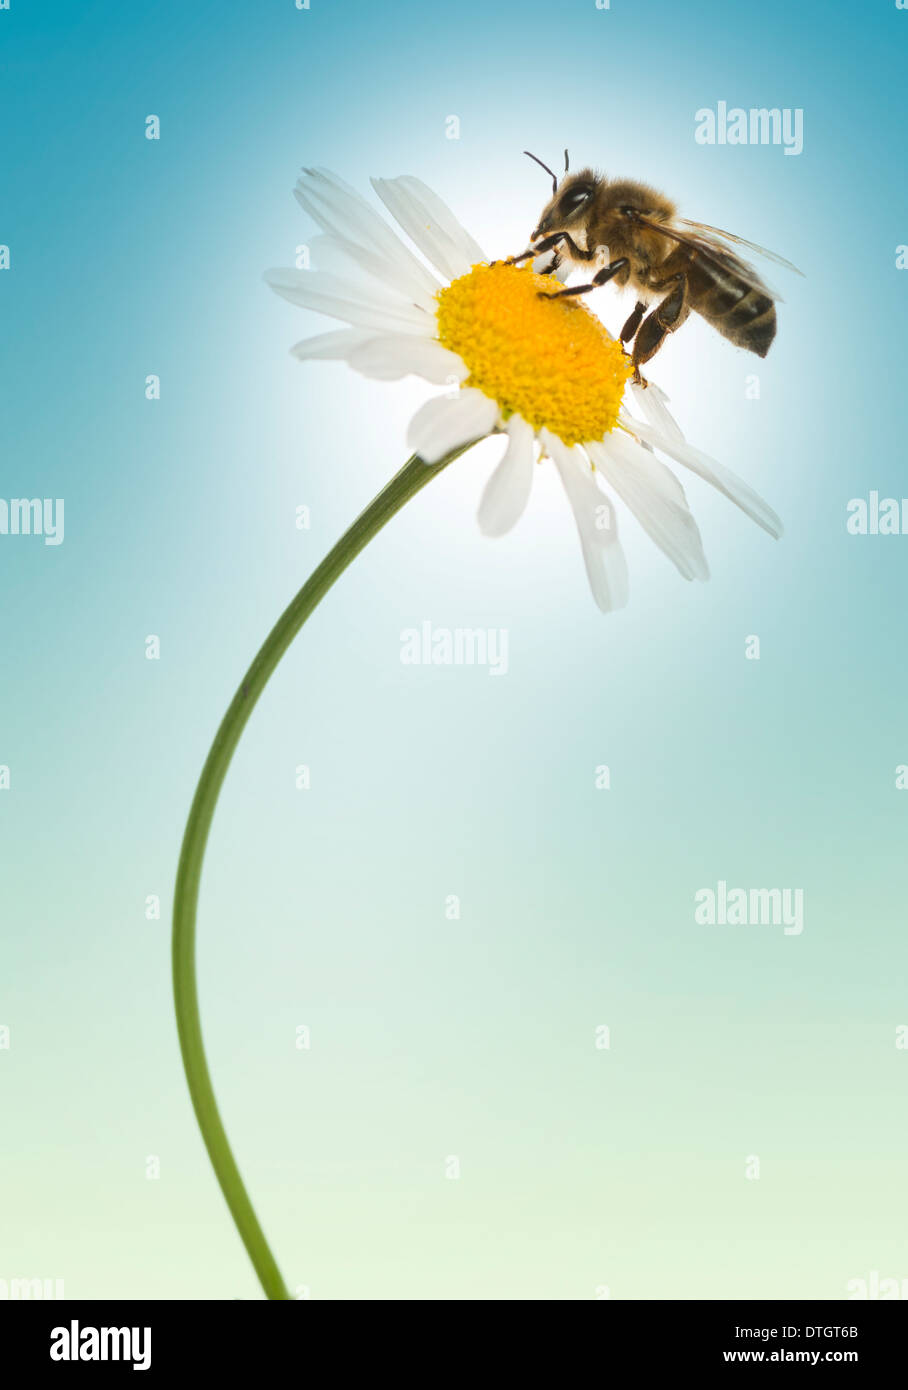 European honey bee gathering pollen on a daisy, Apis mellifera, on a blue background - Stock Image